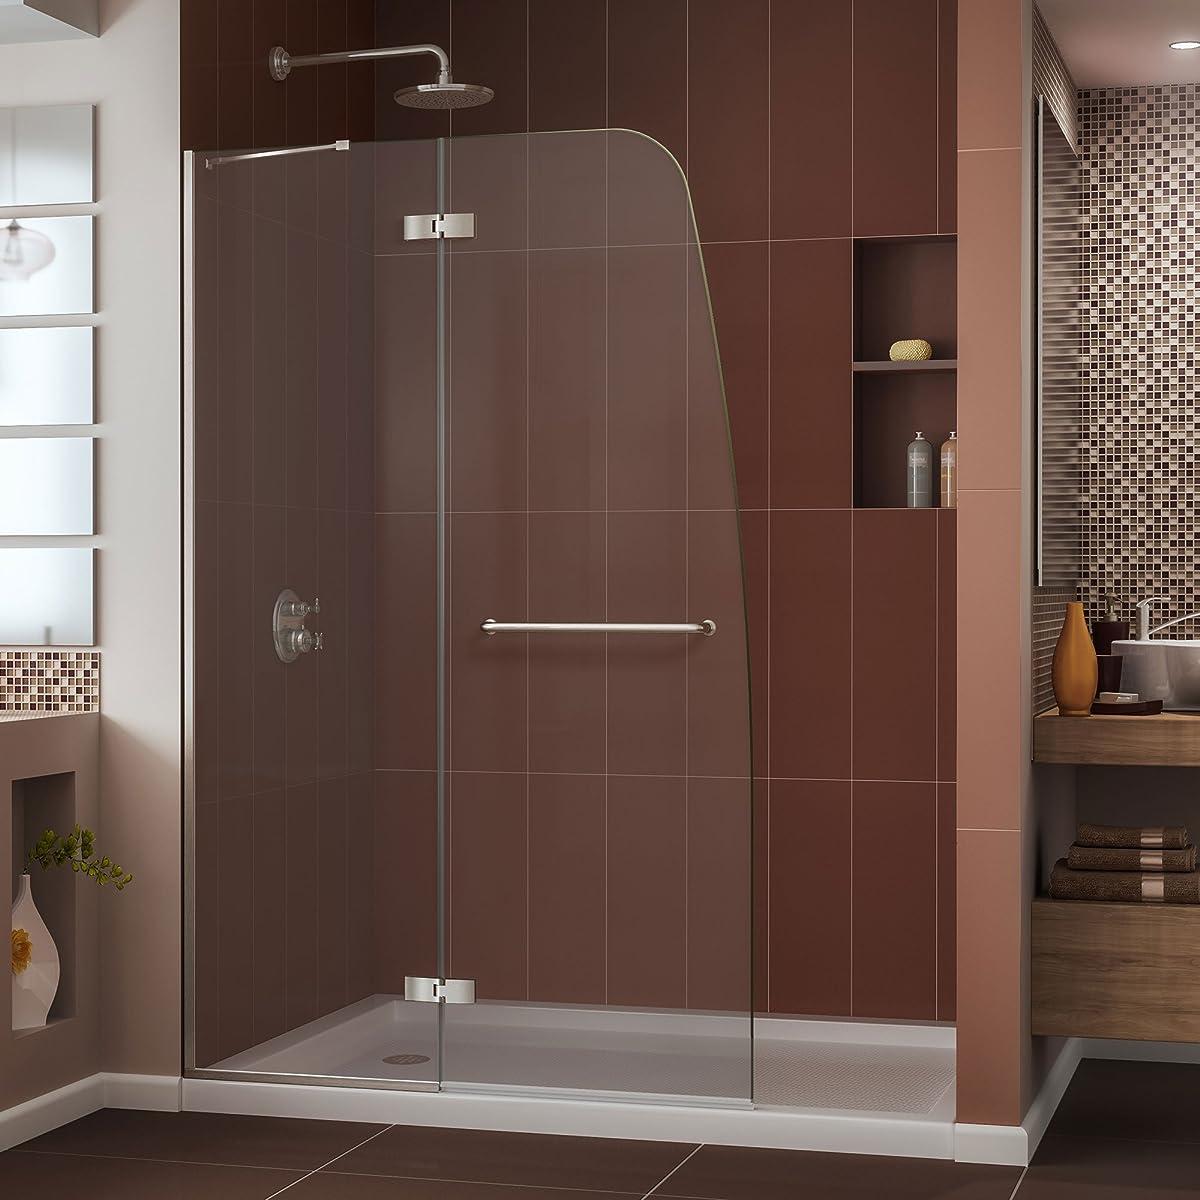 "DreamLine Aqua Ultra 45 in. Width, Frameless Hinged Shower Door, 5/16"" Glass, Brushed Nickel Finish"